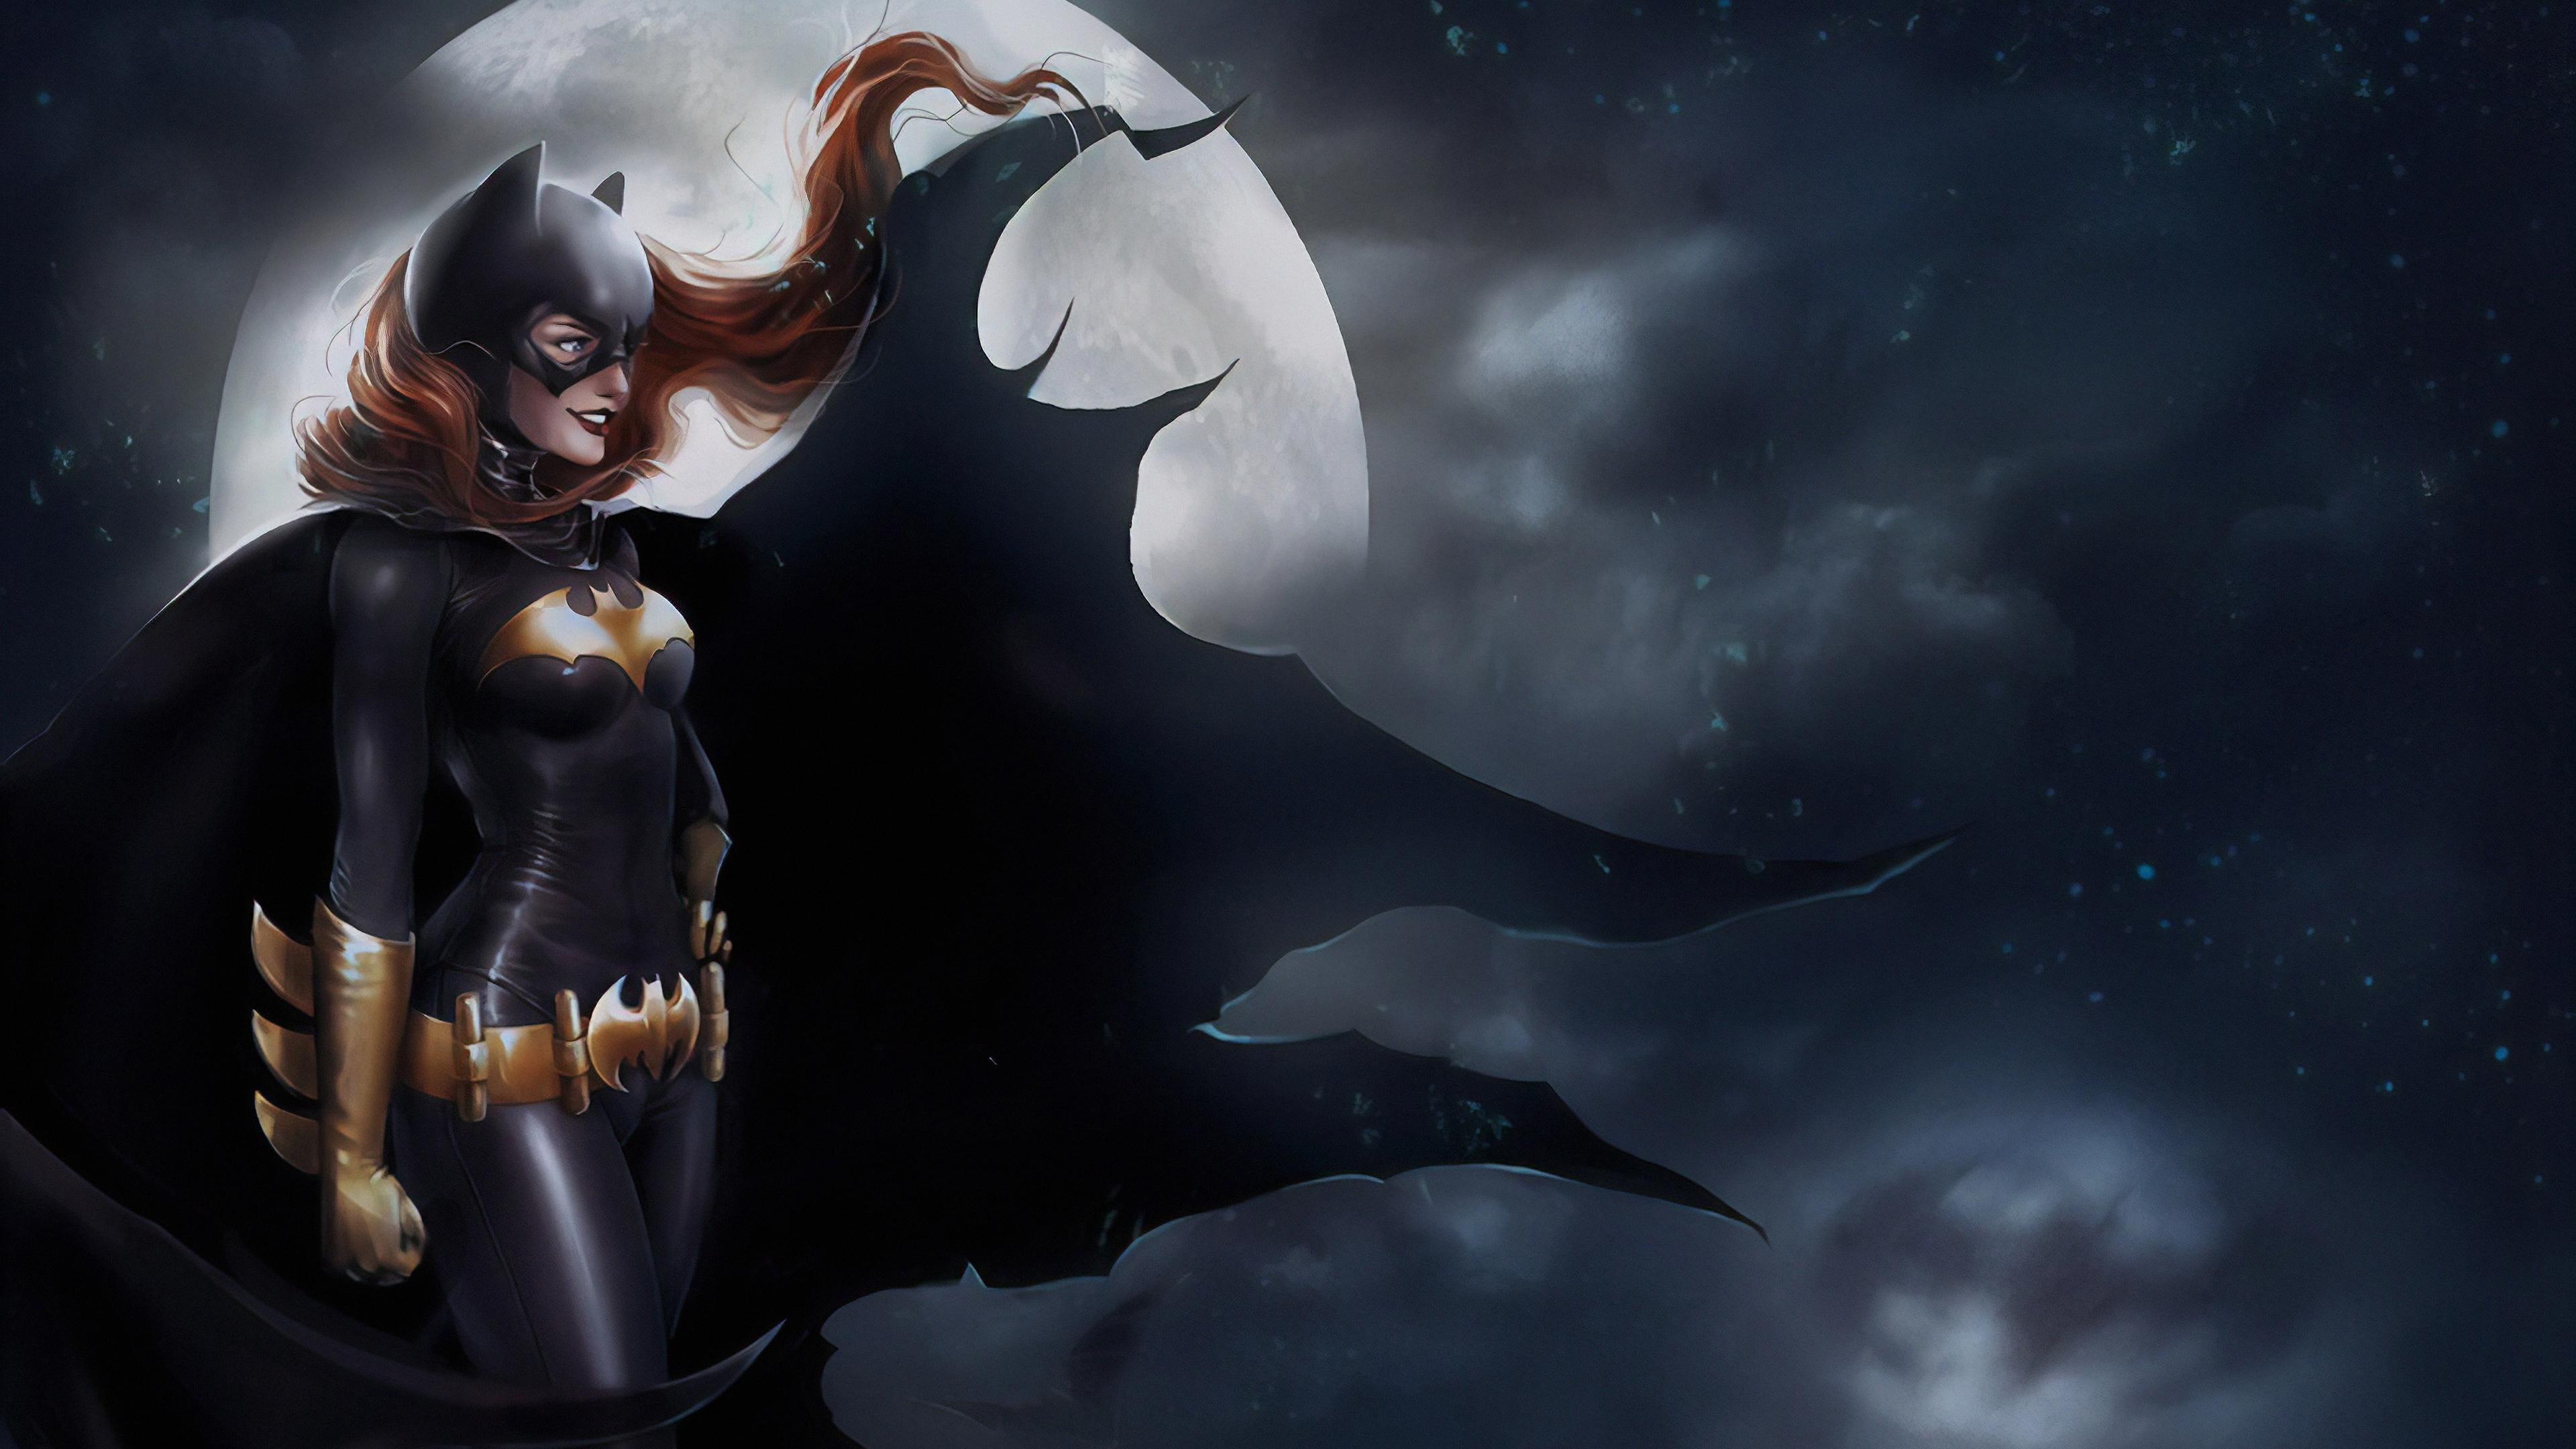 batwoman art 1565053369 - Batwoman Art - superheroes wallpapers, hd-wallpapers, digital art wallpapers, batwoman wallpapers, artwork wallpapers, 4k-wallpapers